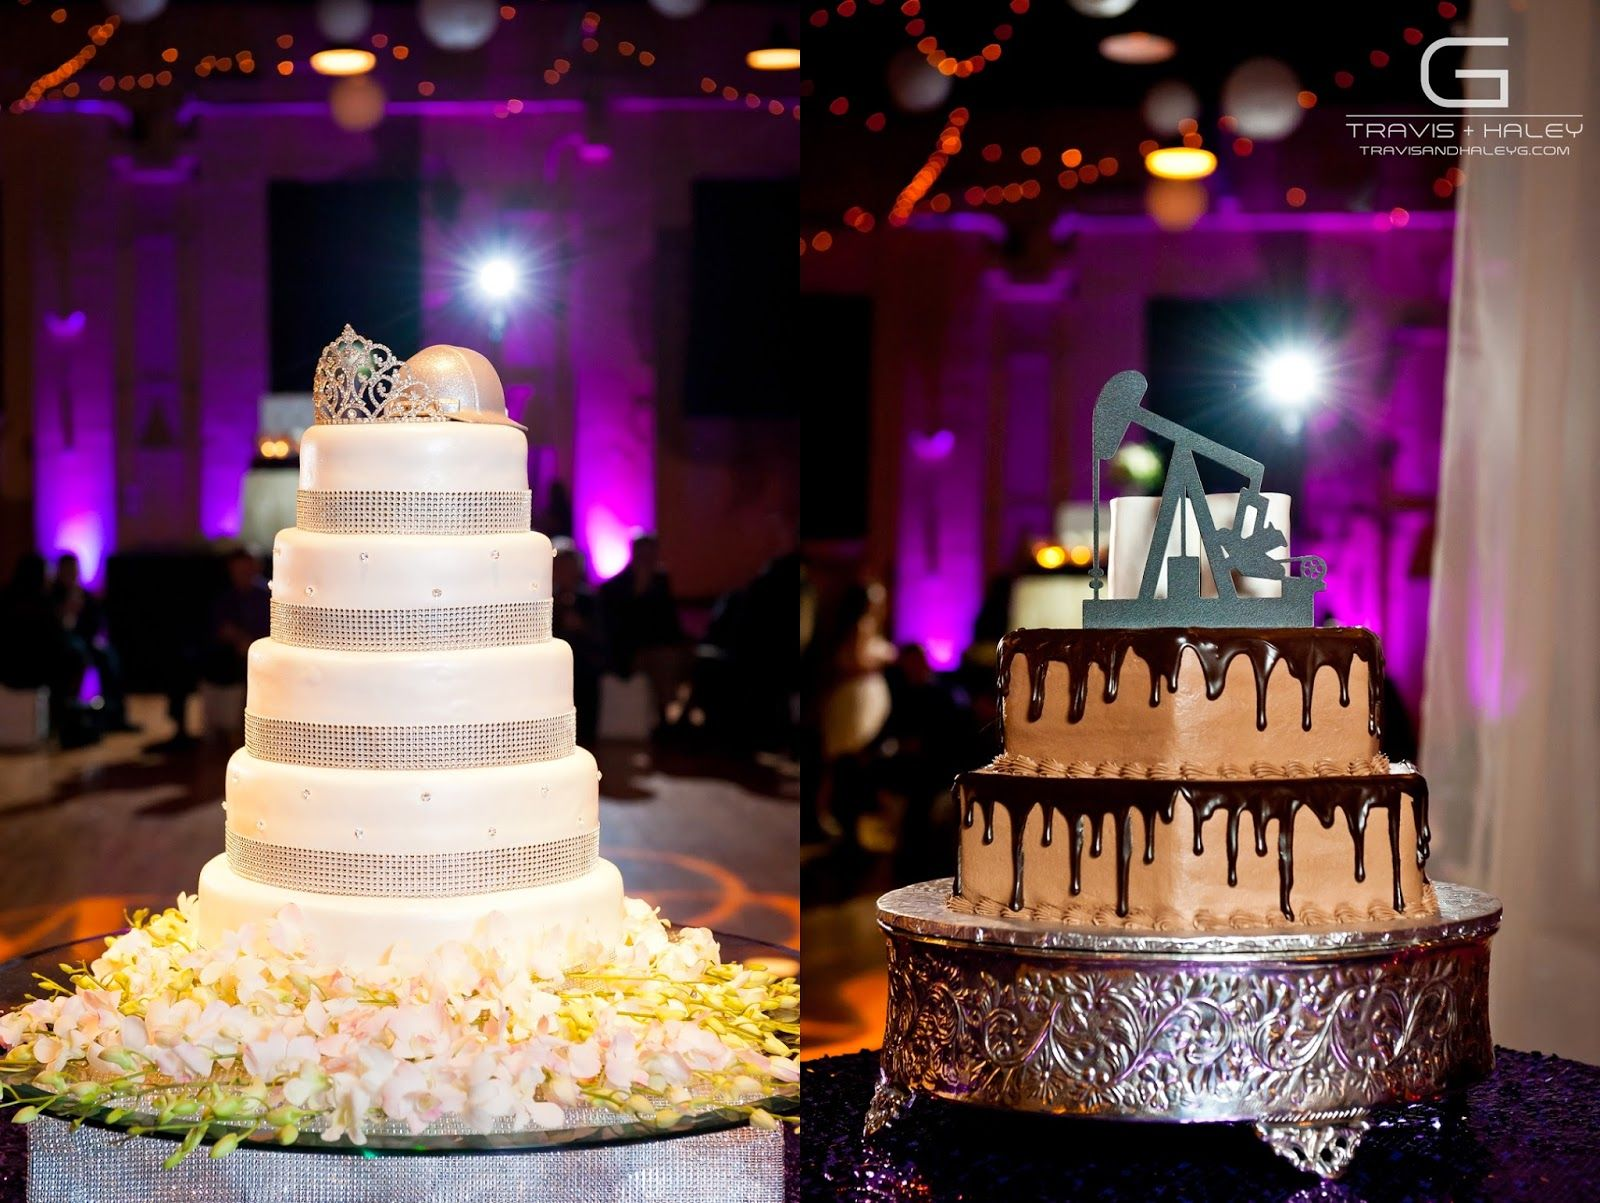 Tiara and Hard Hat cake topper, Oilfield Groom's cake